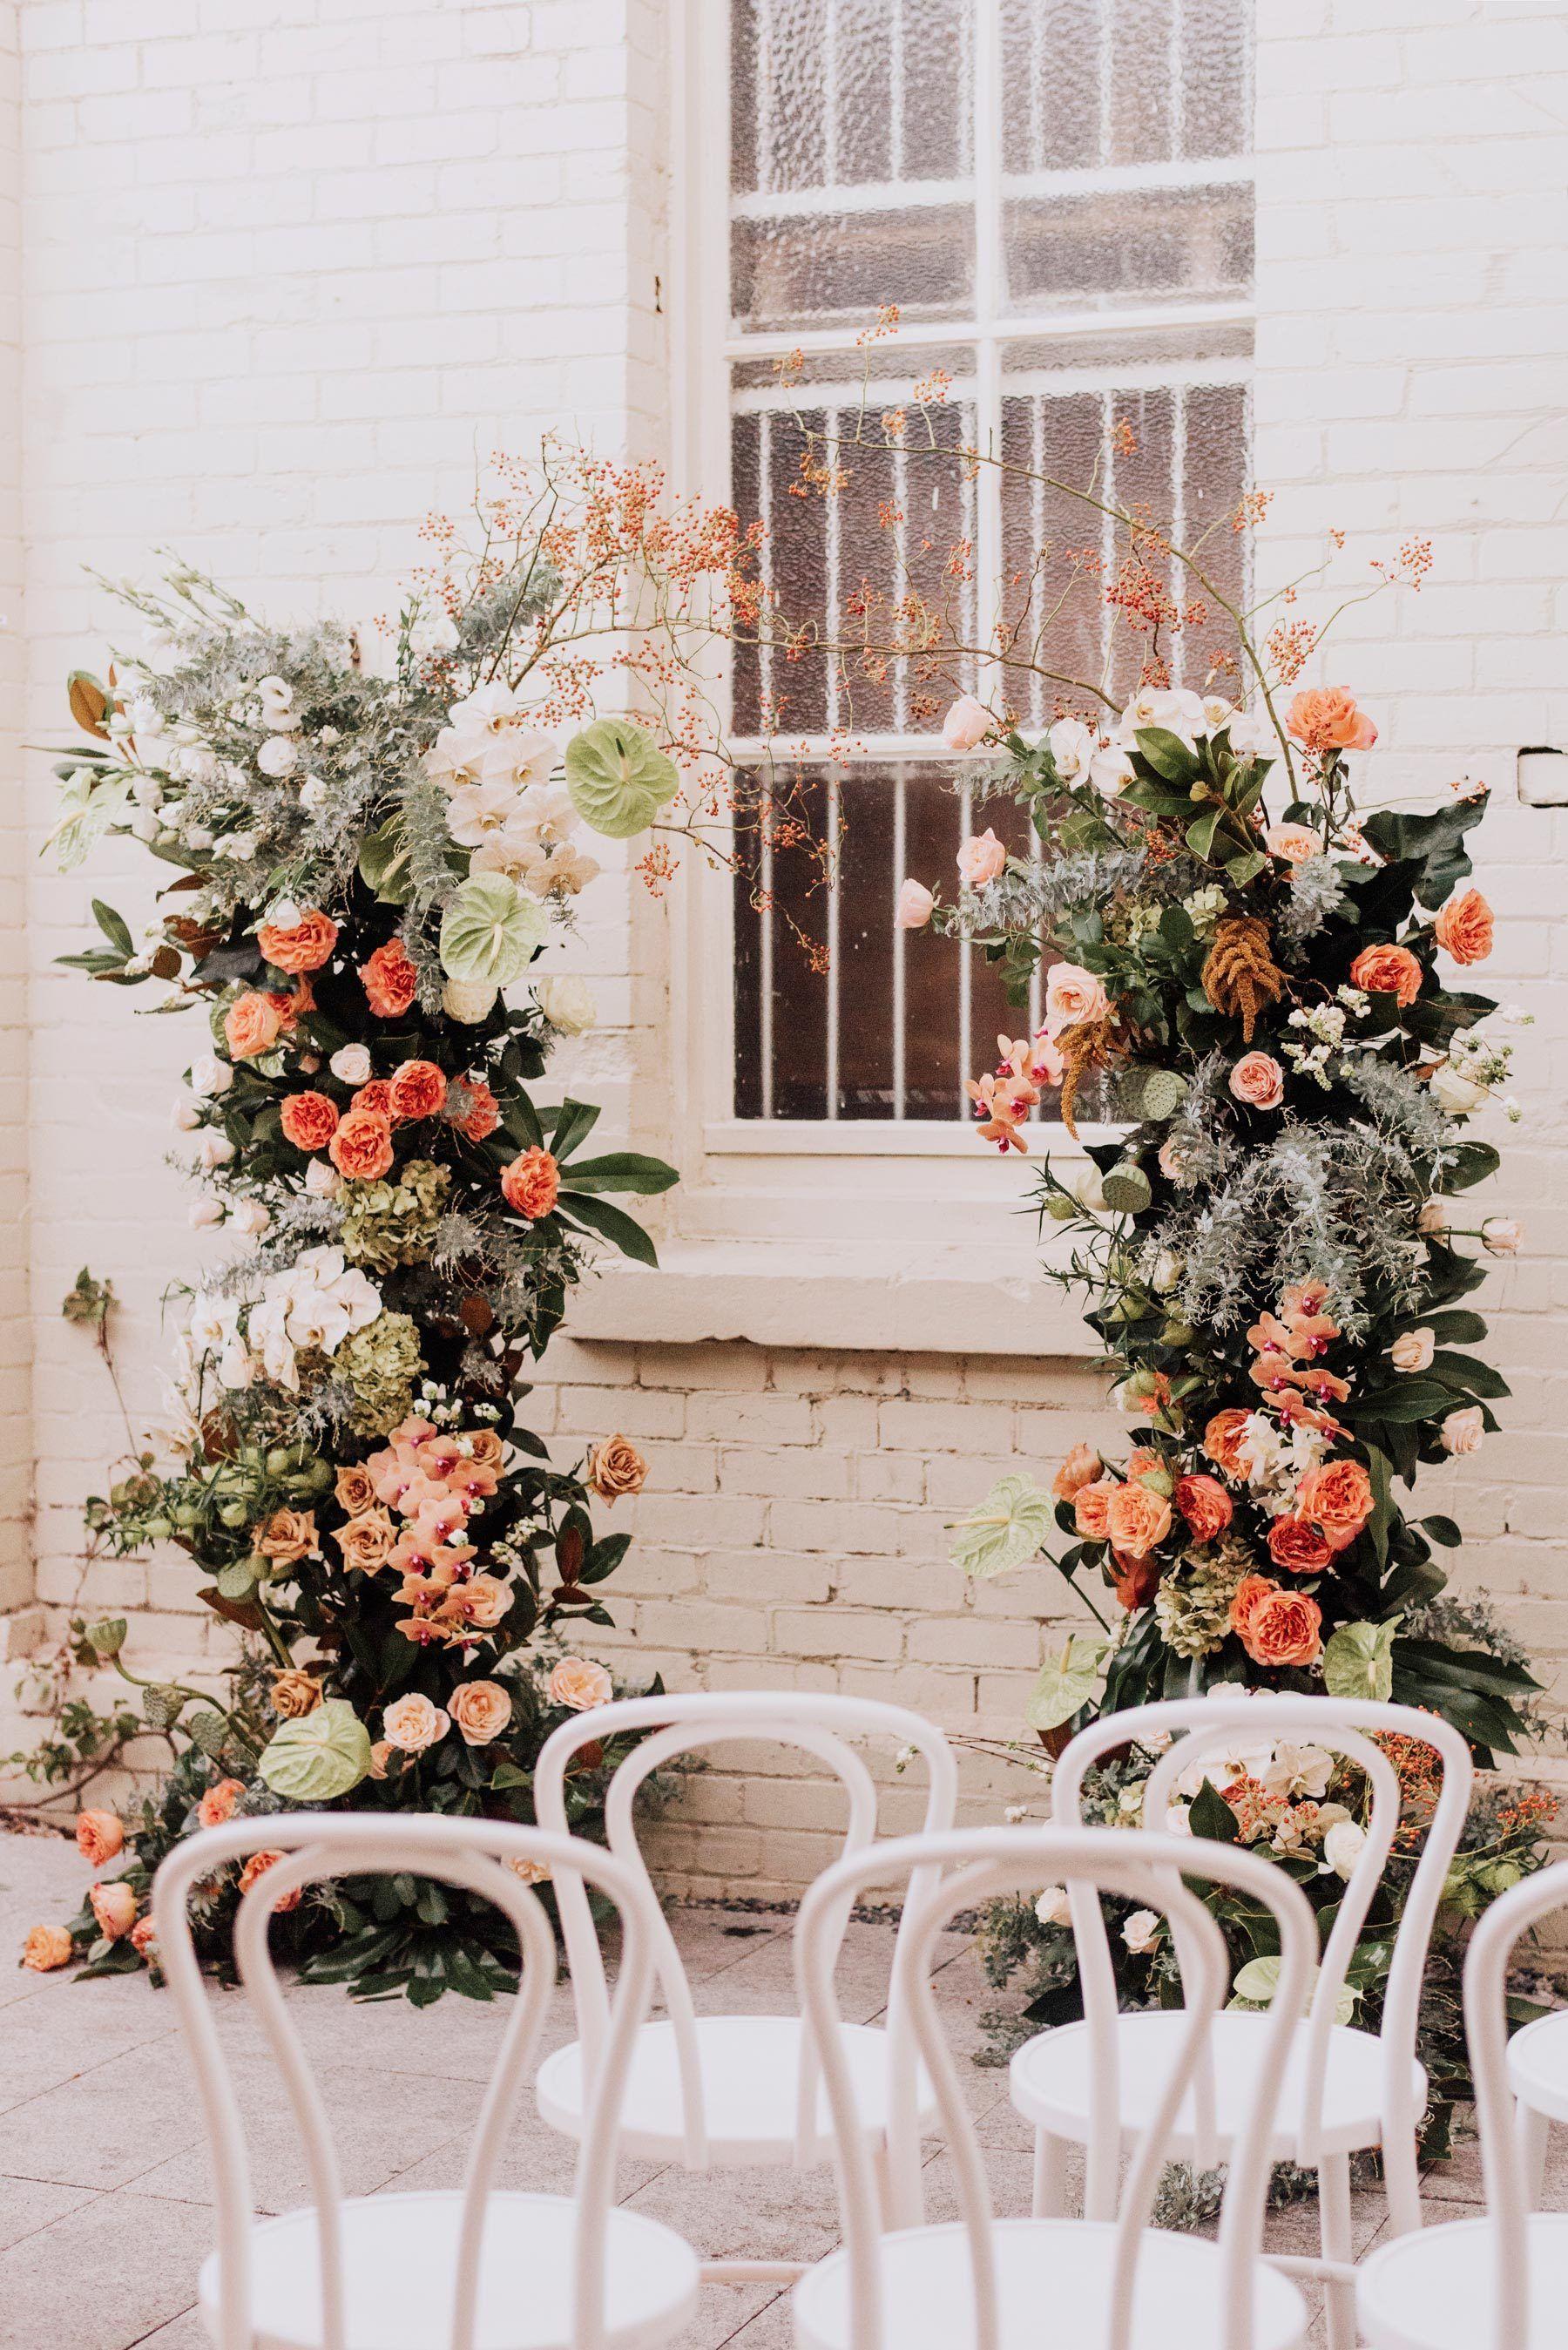 Signature Floral Design Creative Wedding Florist Perth Wa Flower Bouquet Wedding Unique Wedding Flowers Wedding Arch